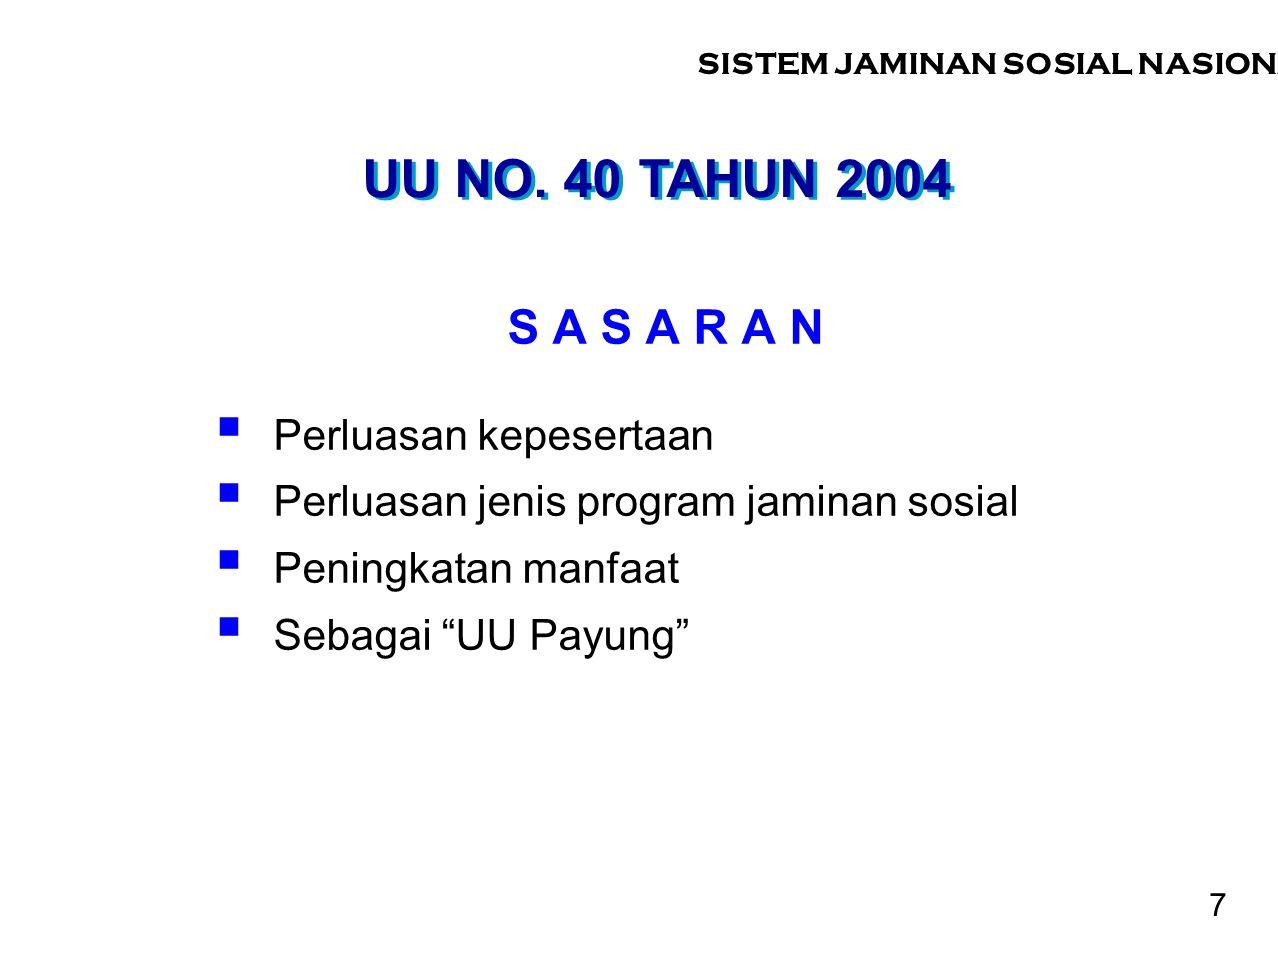 "UU NO. 40 TAHUN 2004 S A S A R A N  Perluasan kepesertaan  Perluasan jenis program jaminan sosial  Peningkatan manfaat  Sebagai ""UU Payung"" SISTEM"